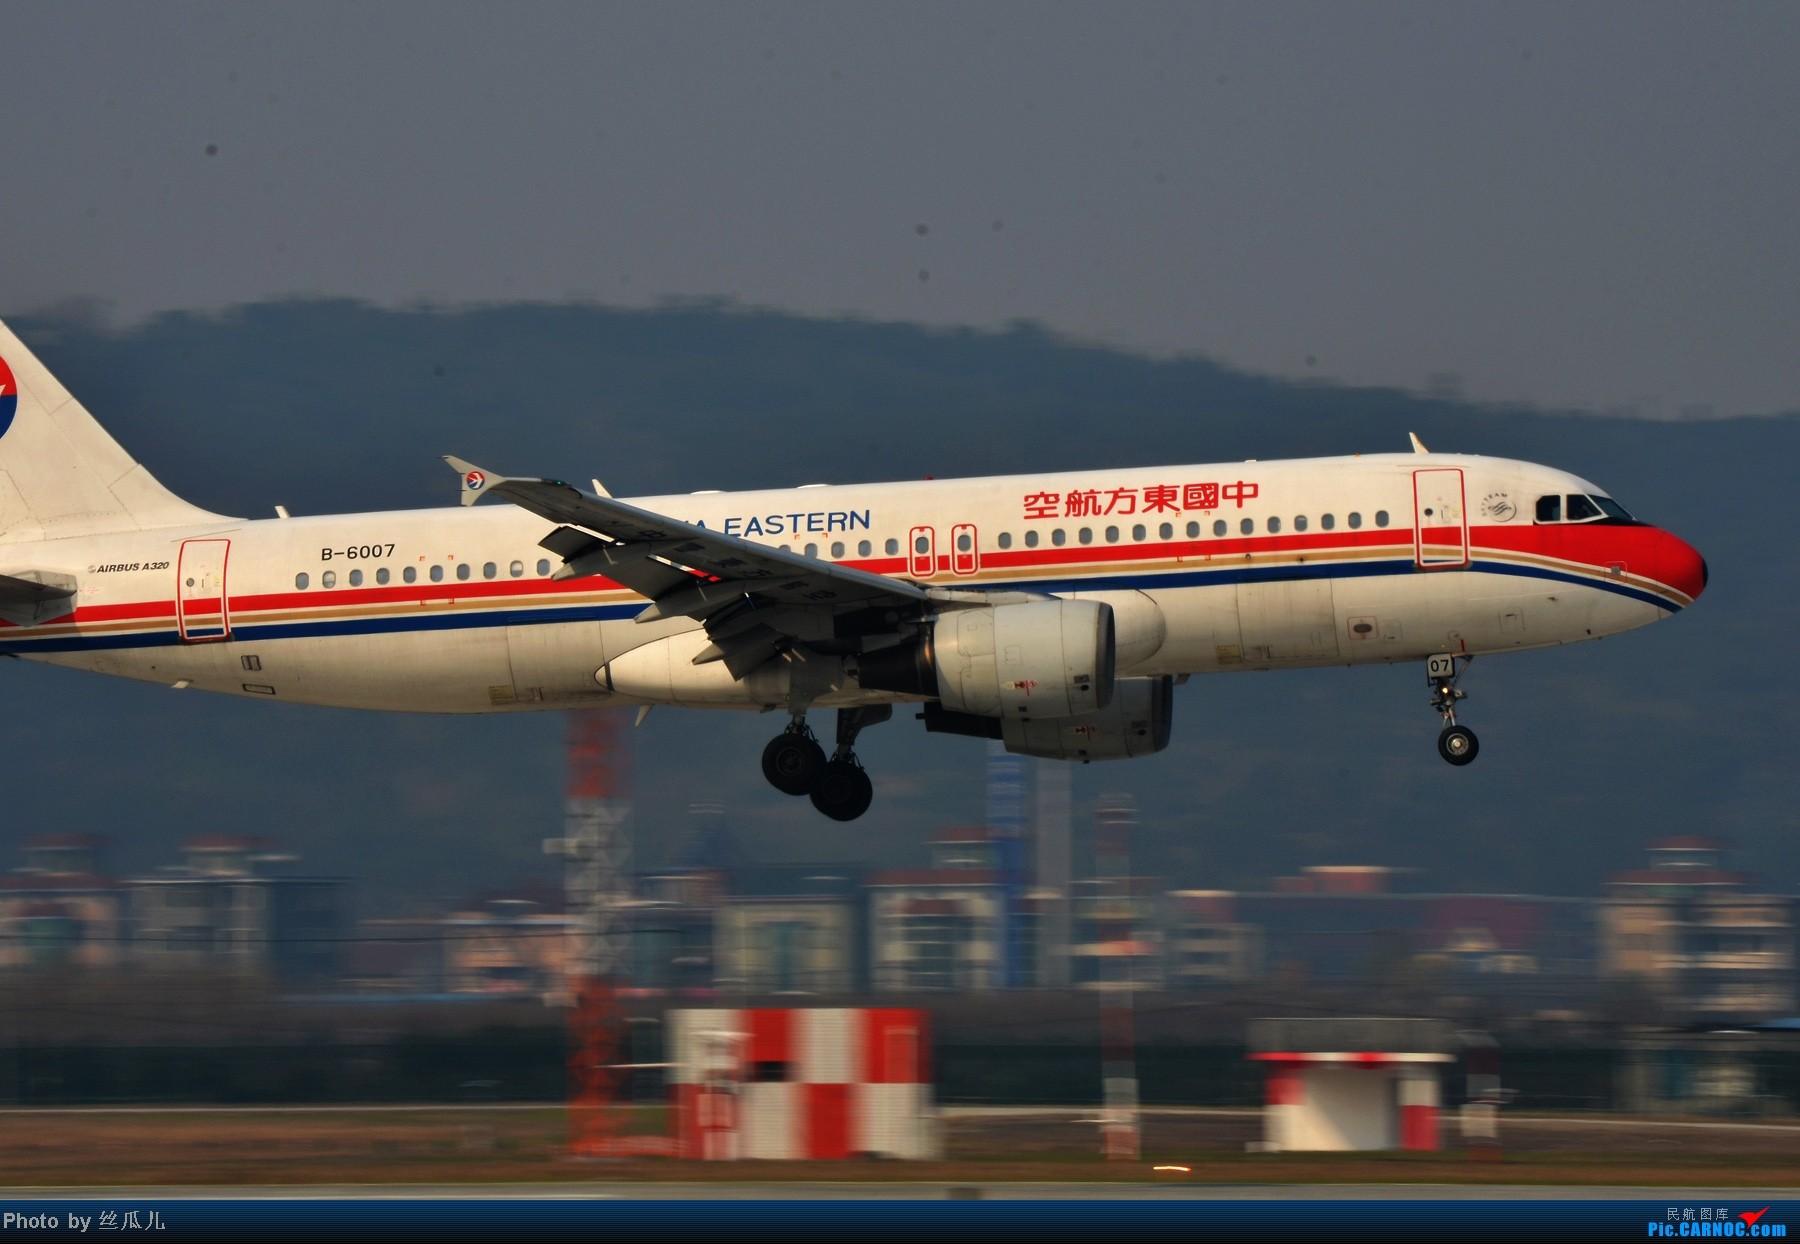 【HGH二跑】话说现在有了制高点加上雾霾天稍稍好转一点,赶紧去二跑甩一甩。 AIRBUS A320-200 B-6007 中国杭州萧山机场